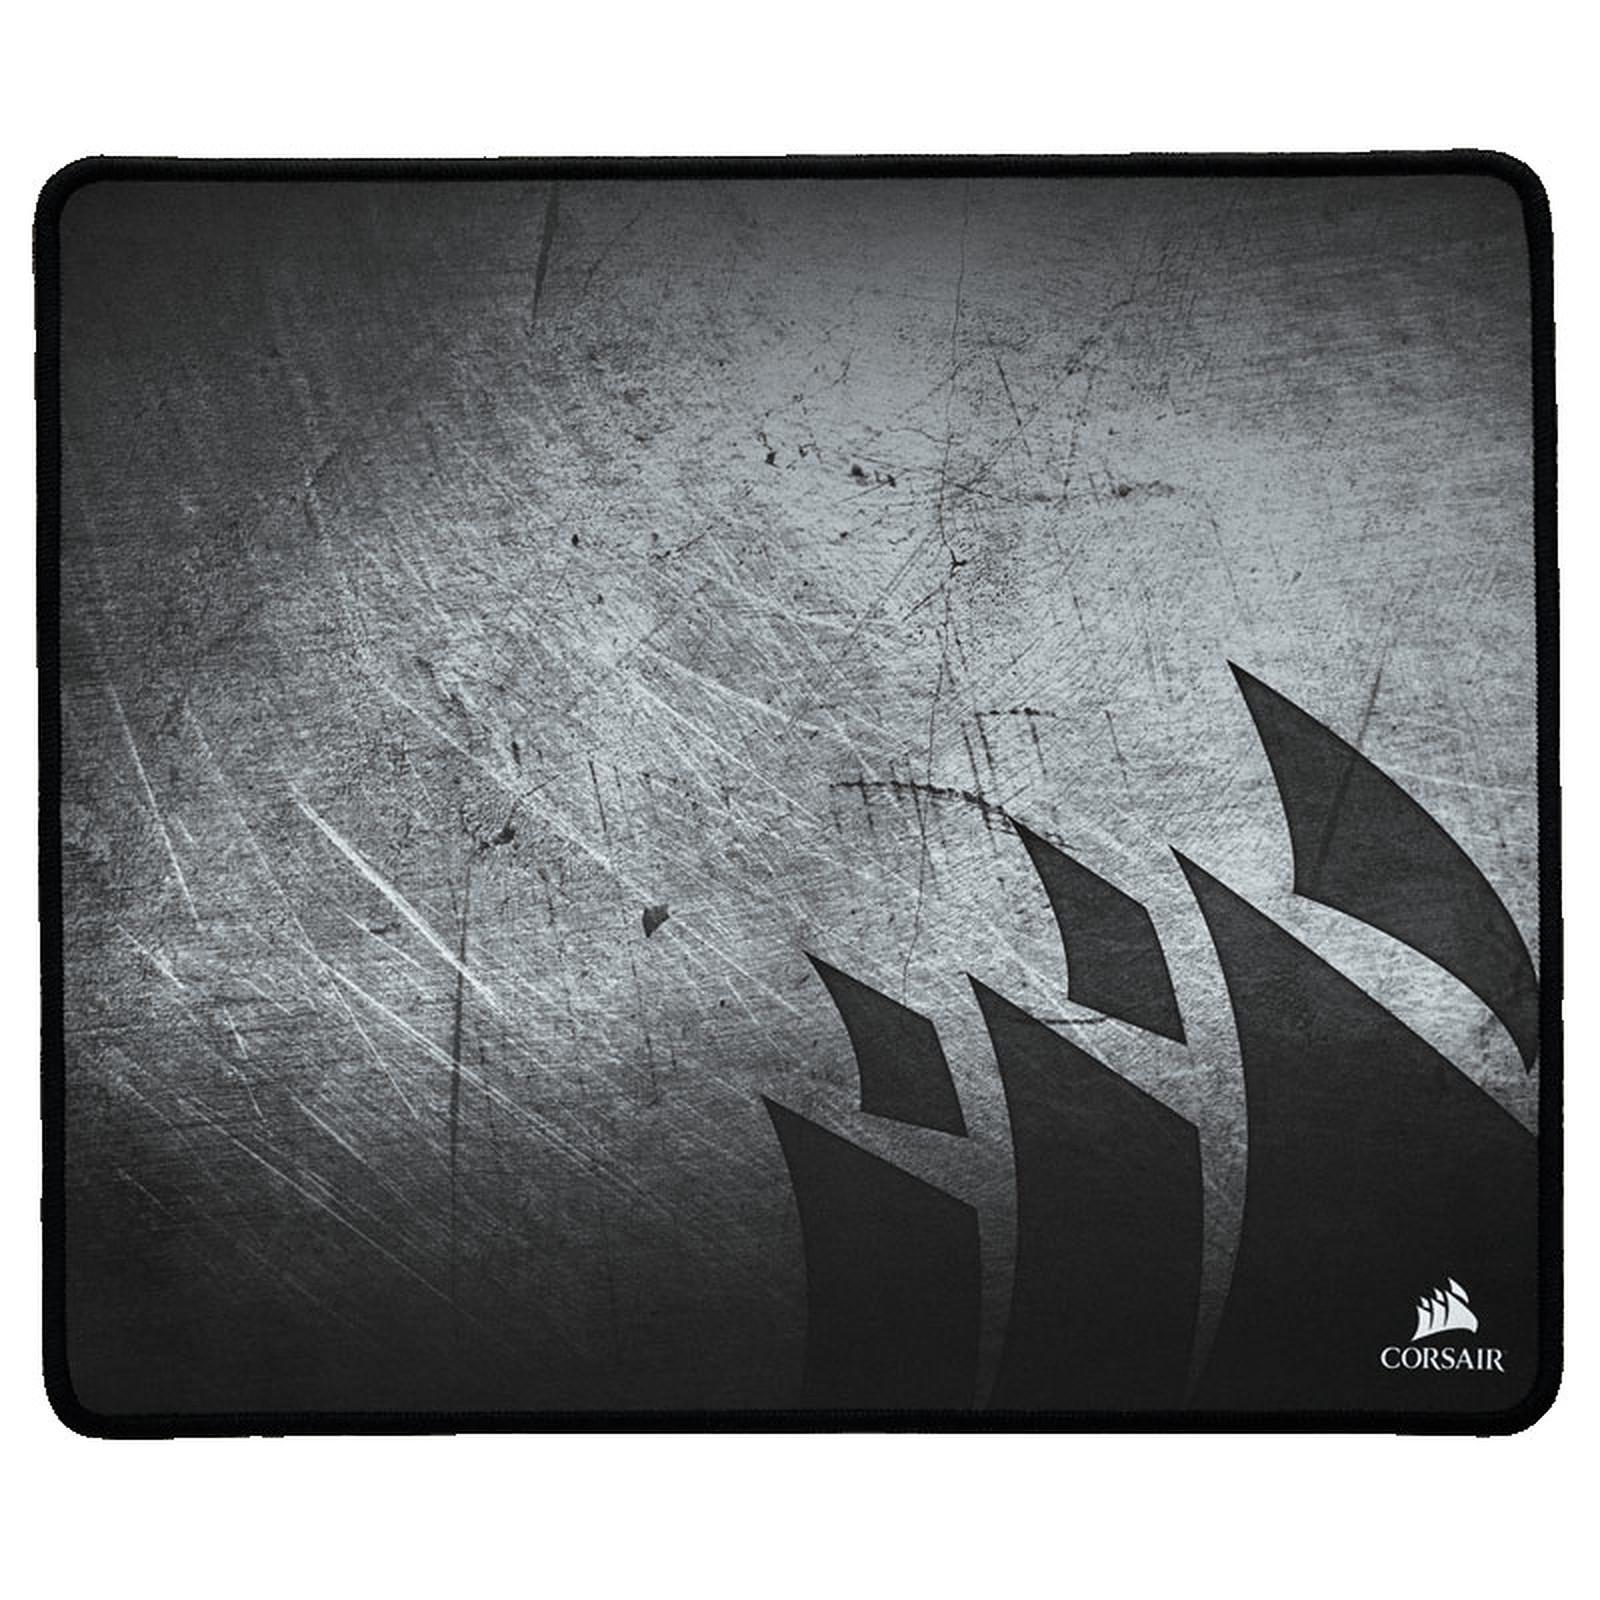 Corsair Gaming MM300 (medium)